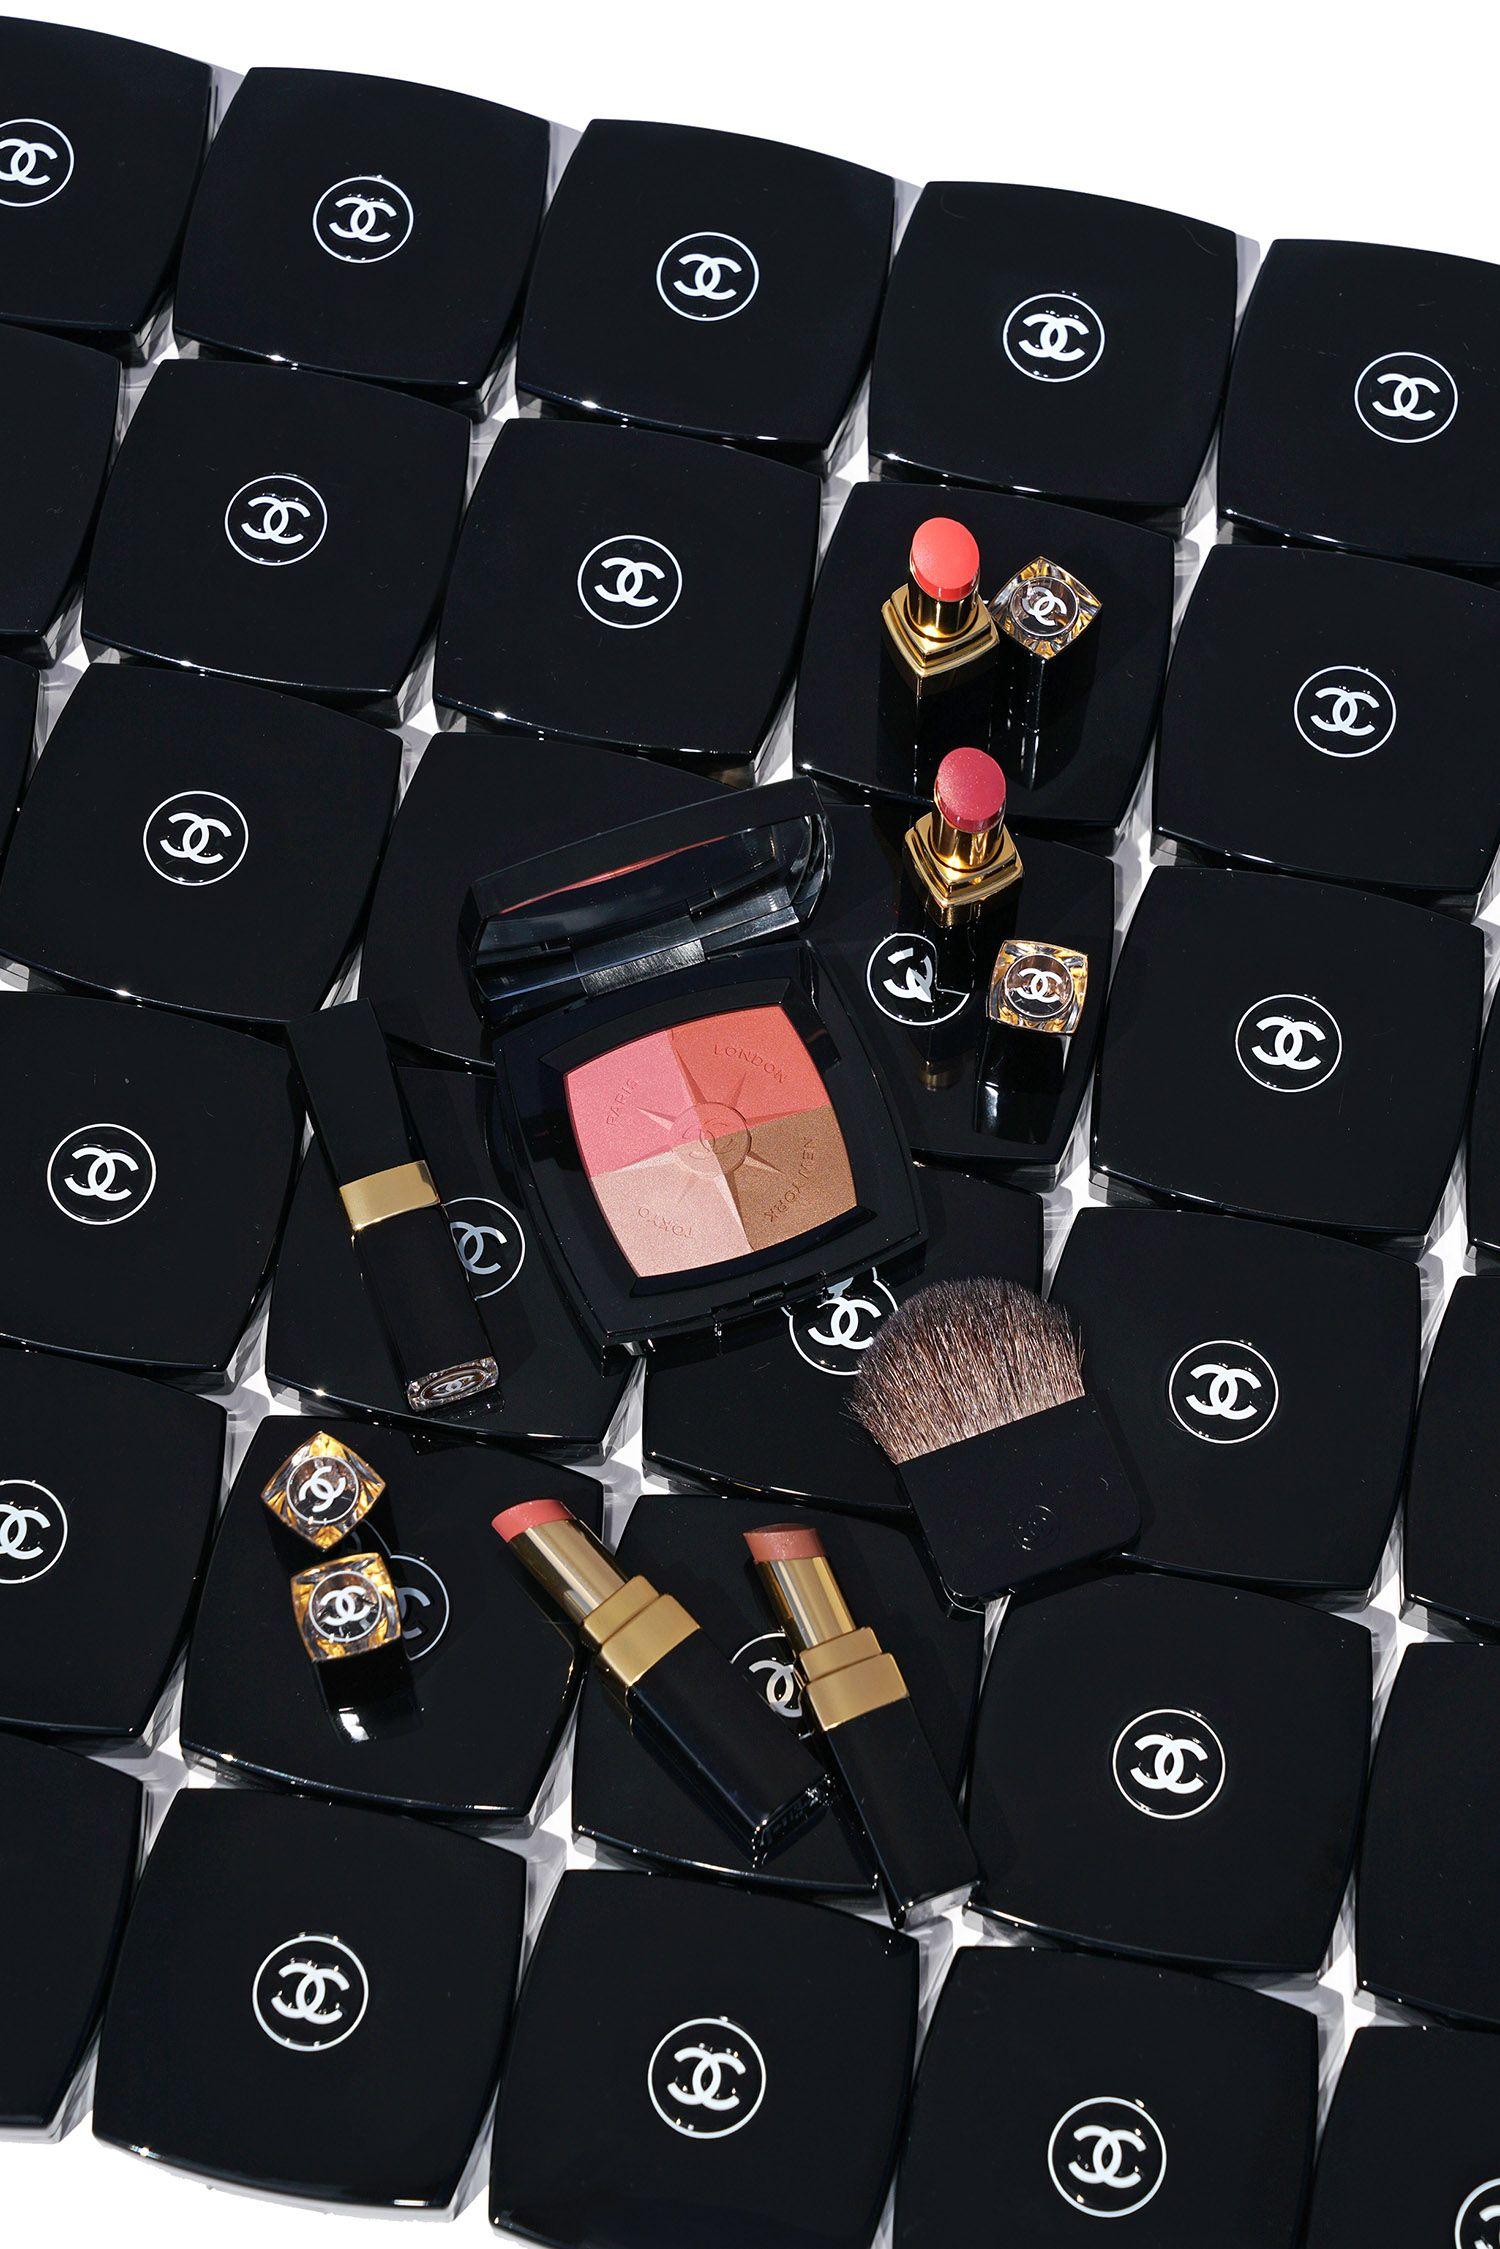 Chanel Rouge Coco Flash Picks + Voyage de Chanel Travel